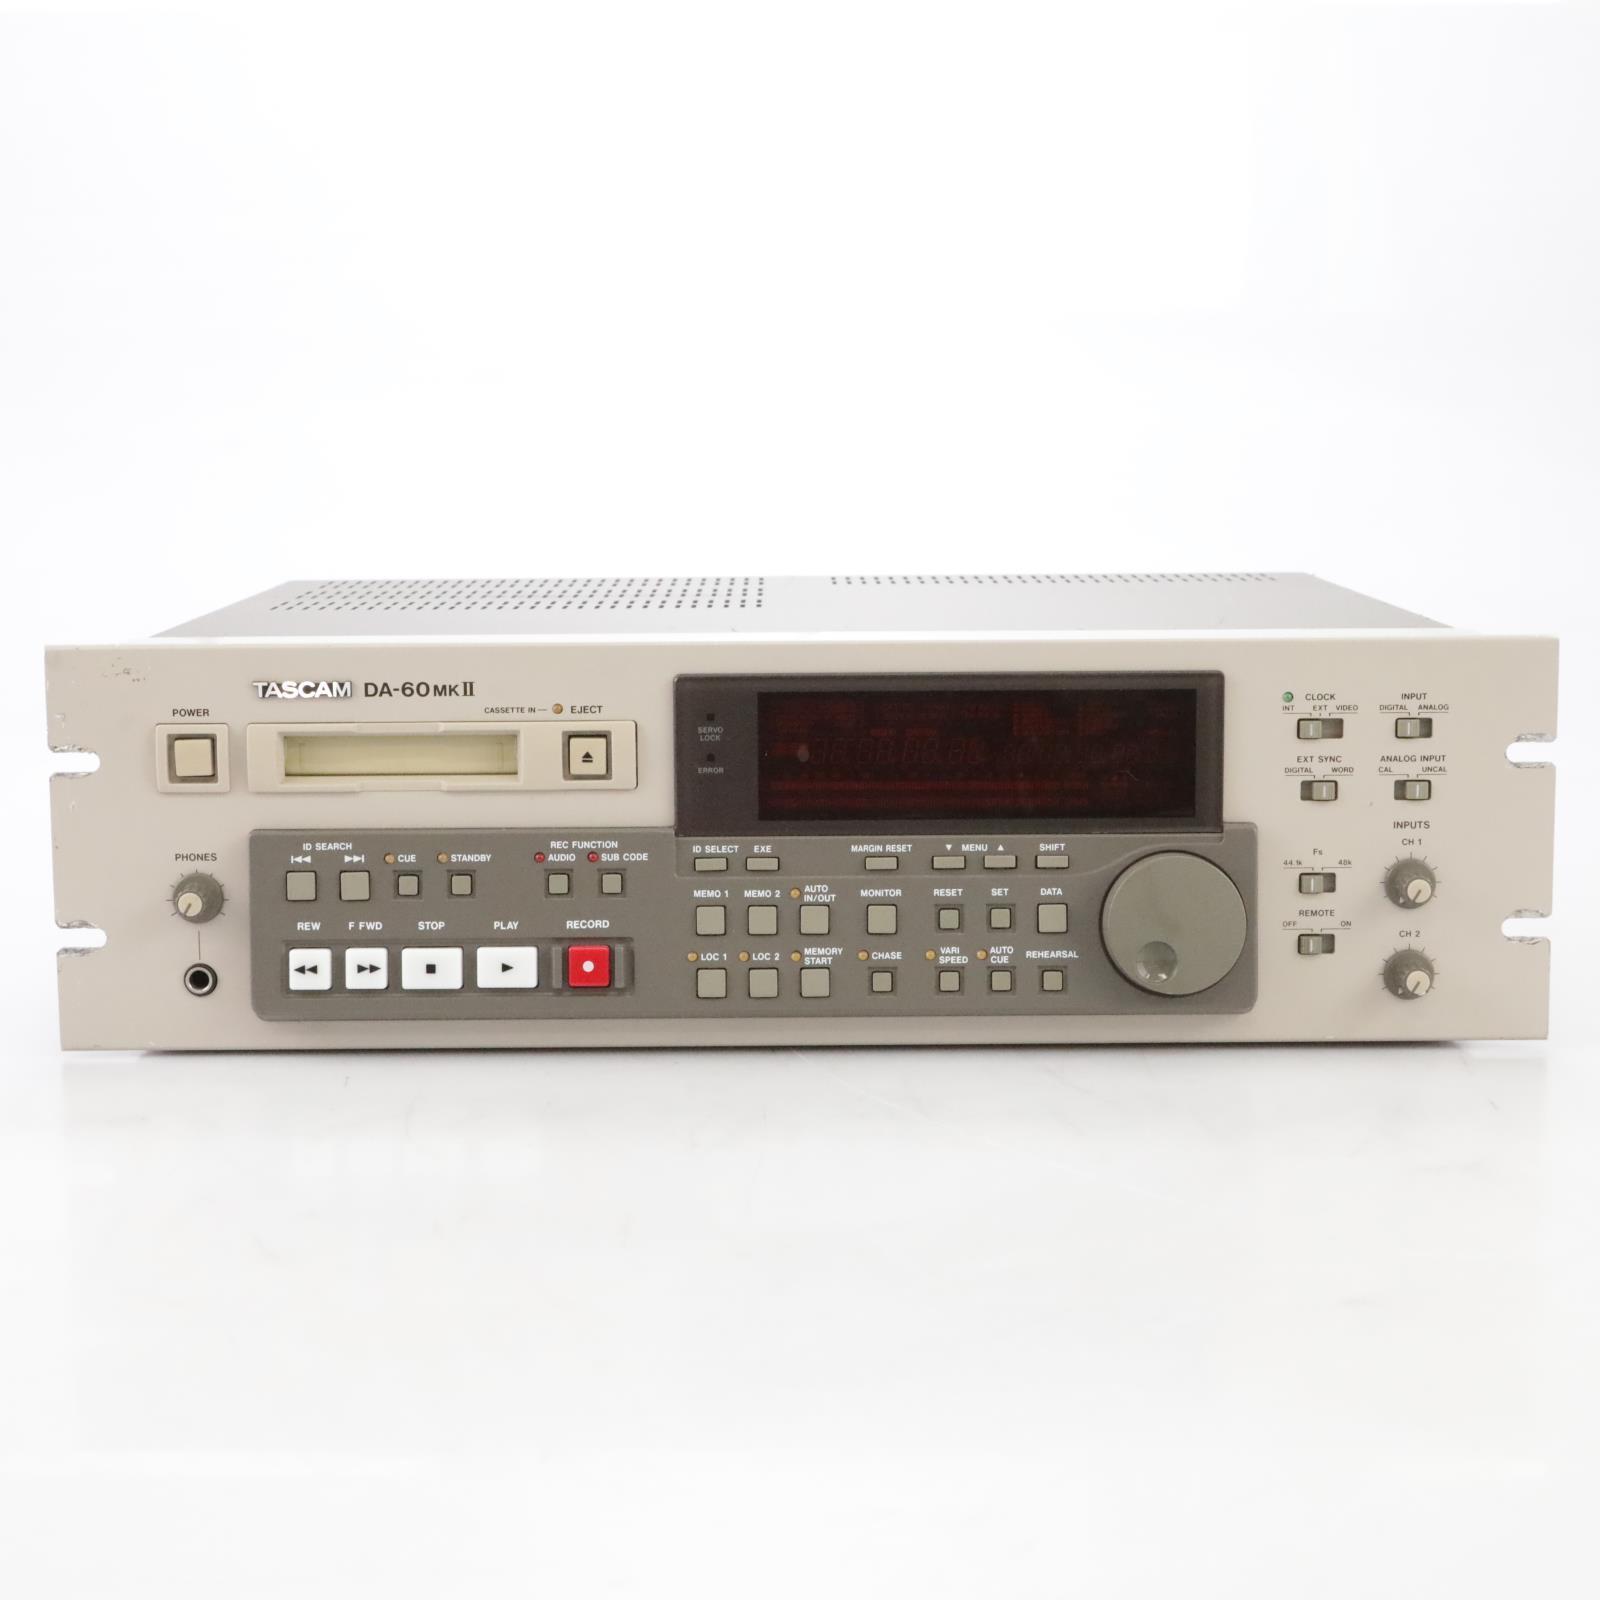 Tascam DA-60 MKII Professional Digital Audio Tape DAT Recorder #44940